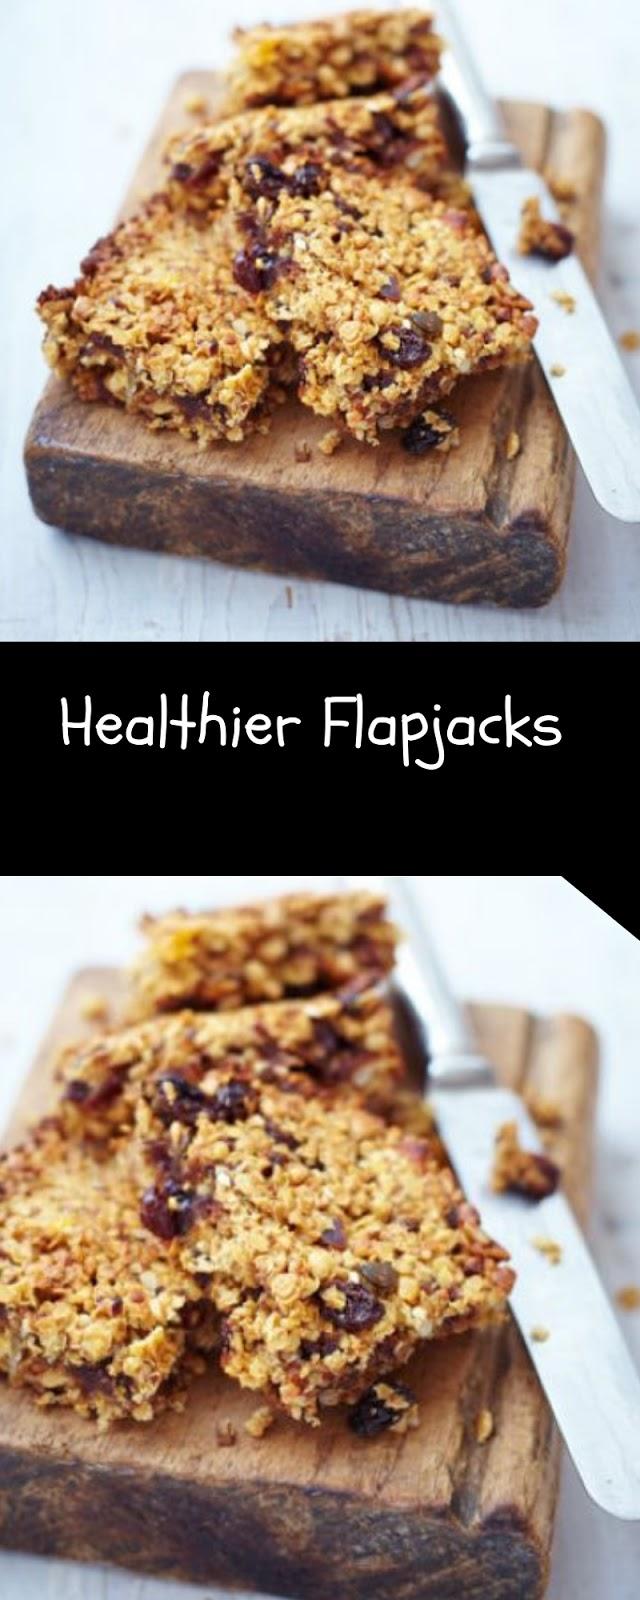 47 Recipe Tasty Fruity Flapjacks: Home Delicious Recipe